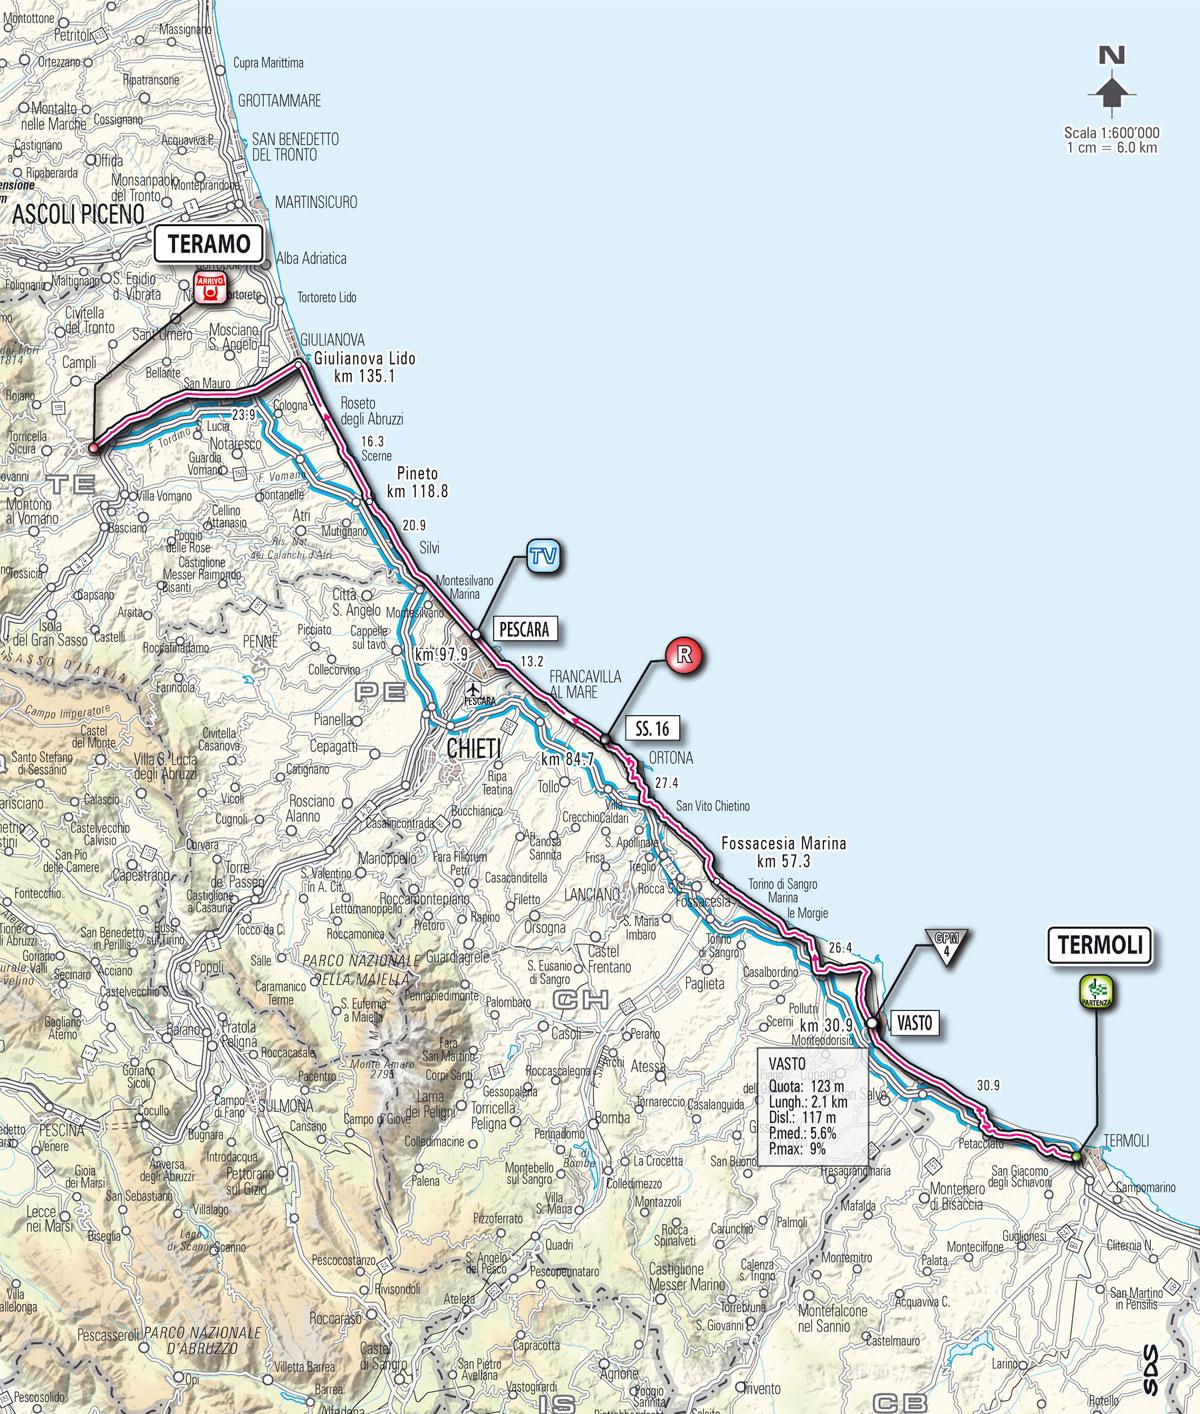 Cartina Italia Termoli.Le Tappe Del Giro D Italia Planimetria E Altimetria